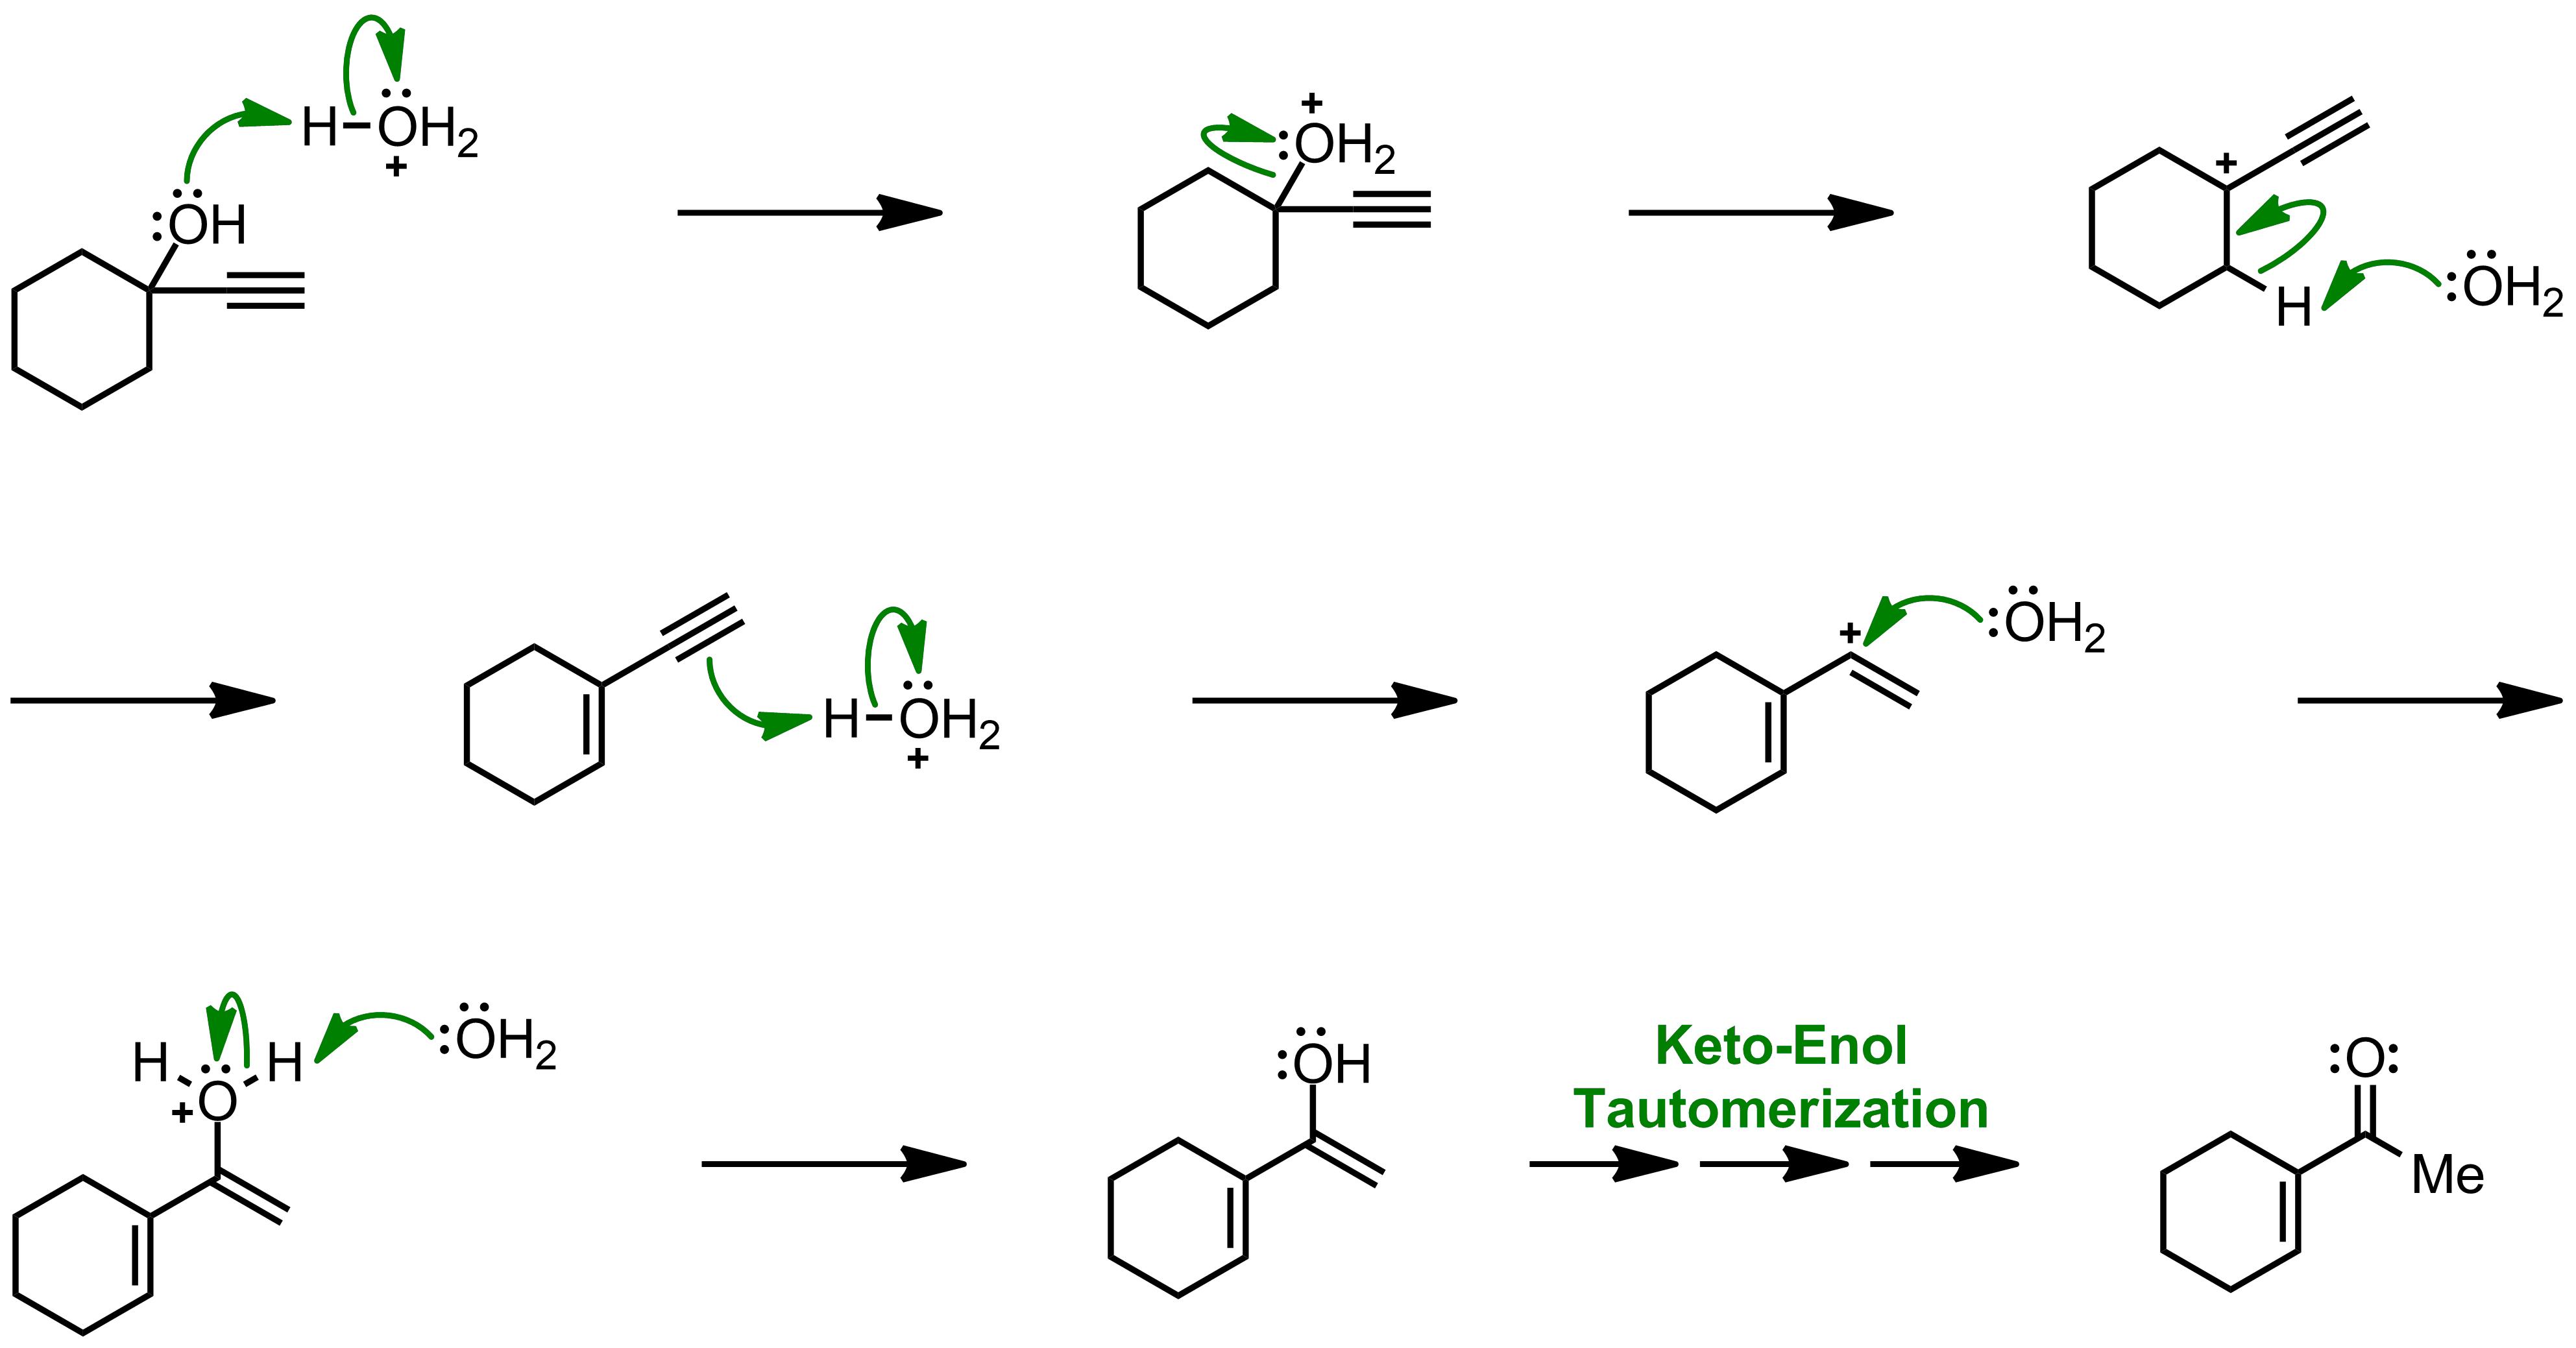 Mechanism of the Rupe Rearrangement